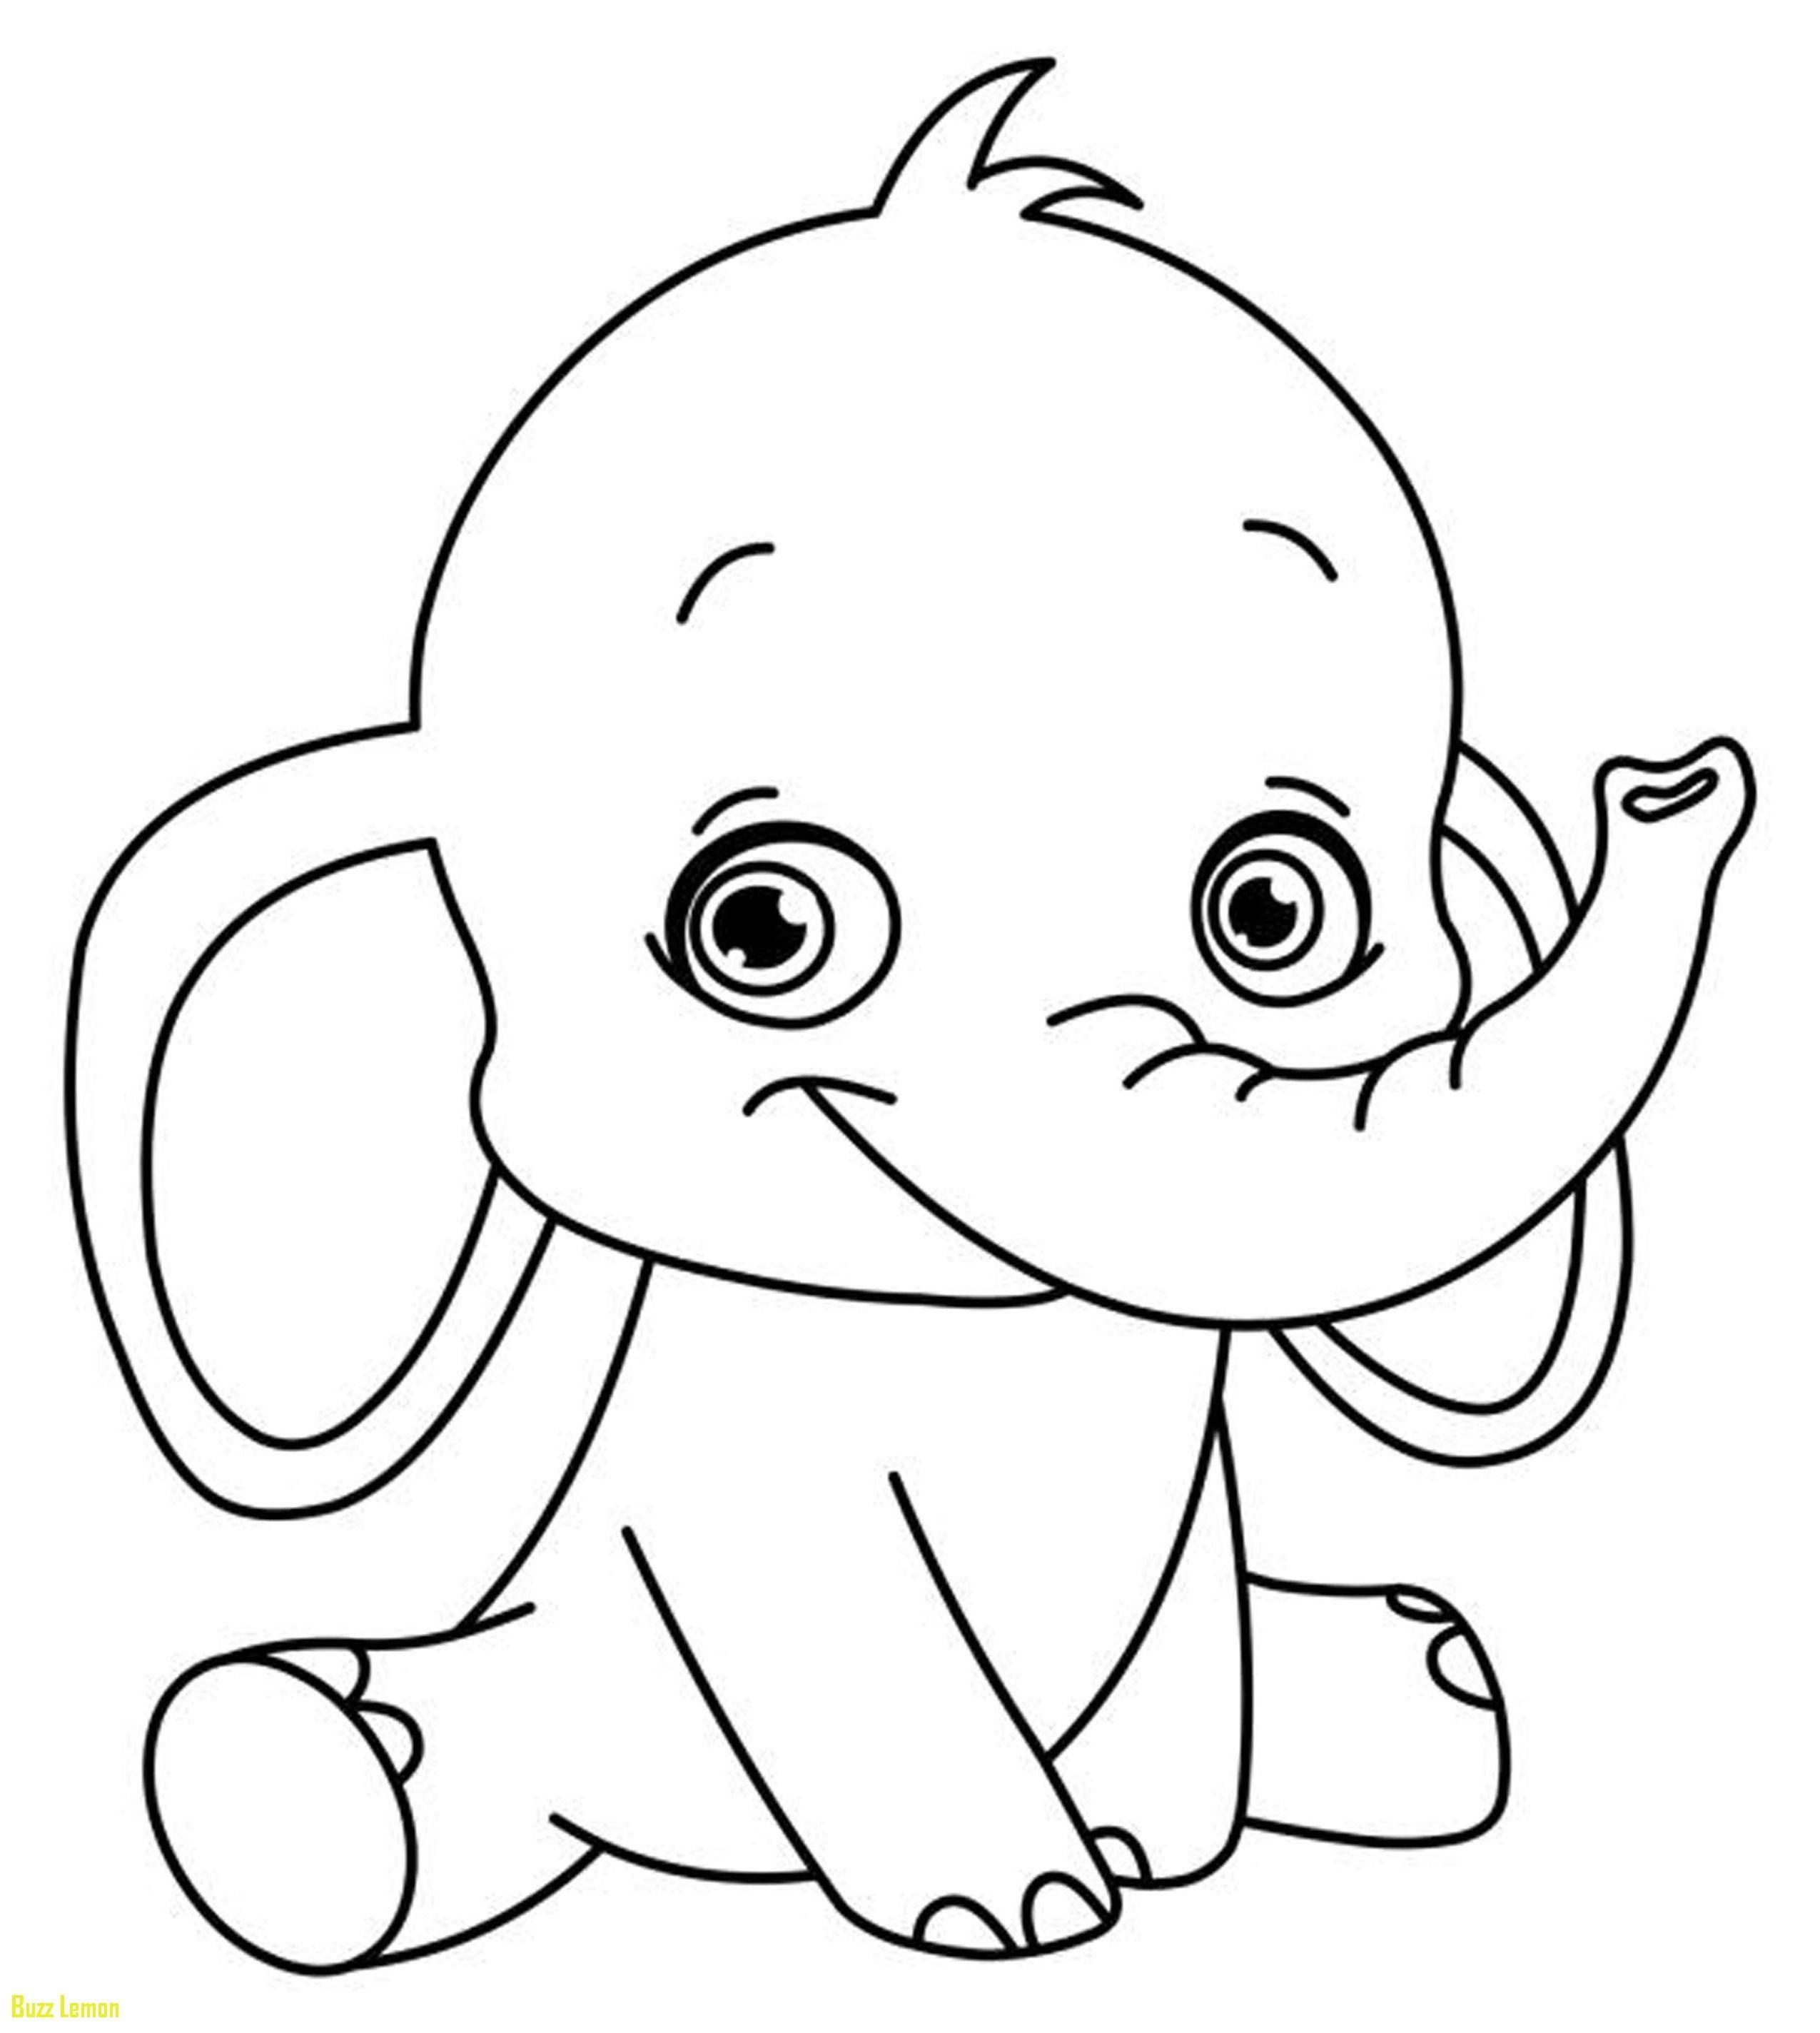 Coloring ~ Preschool Coloring Book Splendi Photo Ideas Sheets - Free Preschool Coloring Sheets Printables